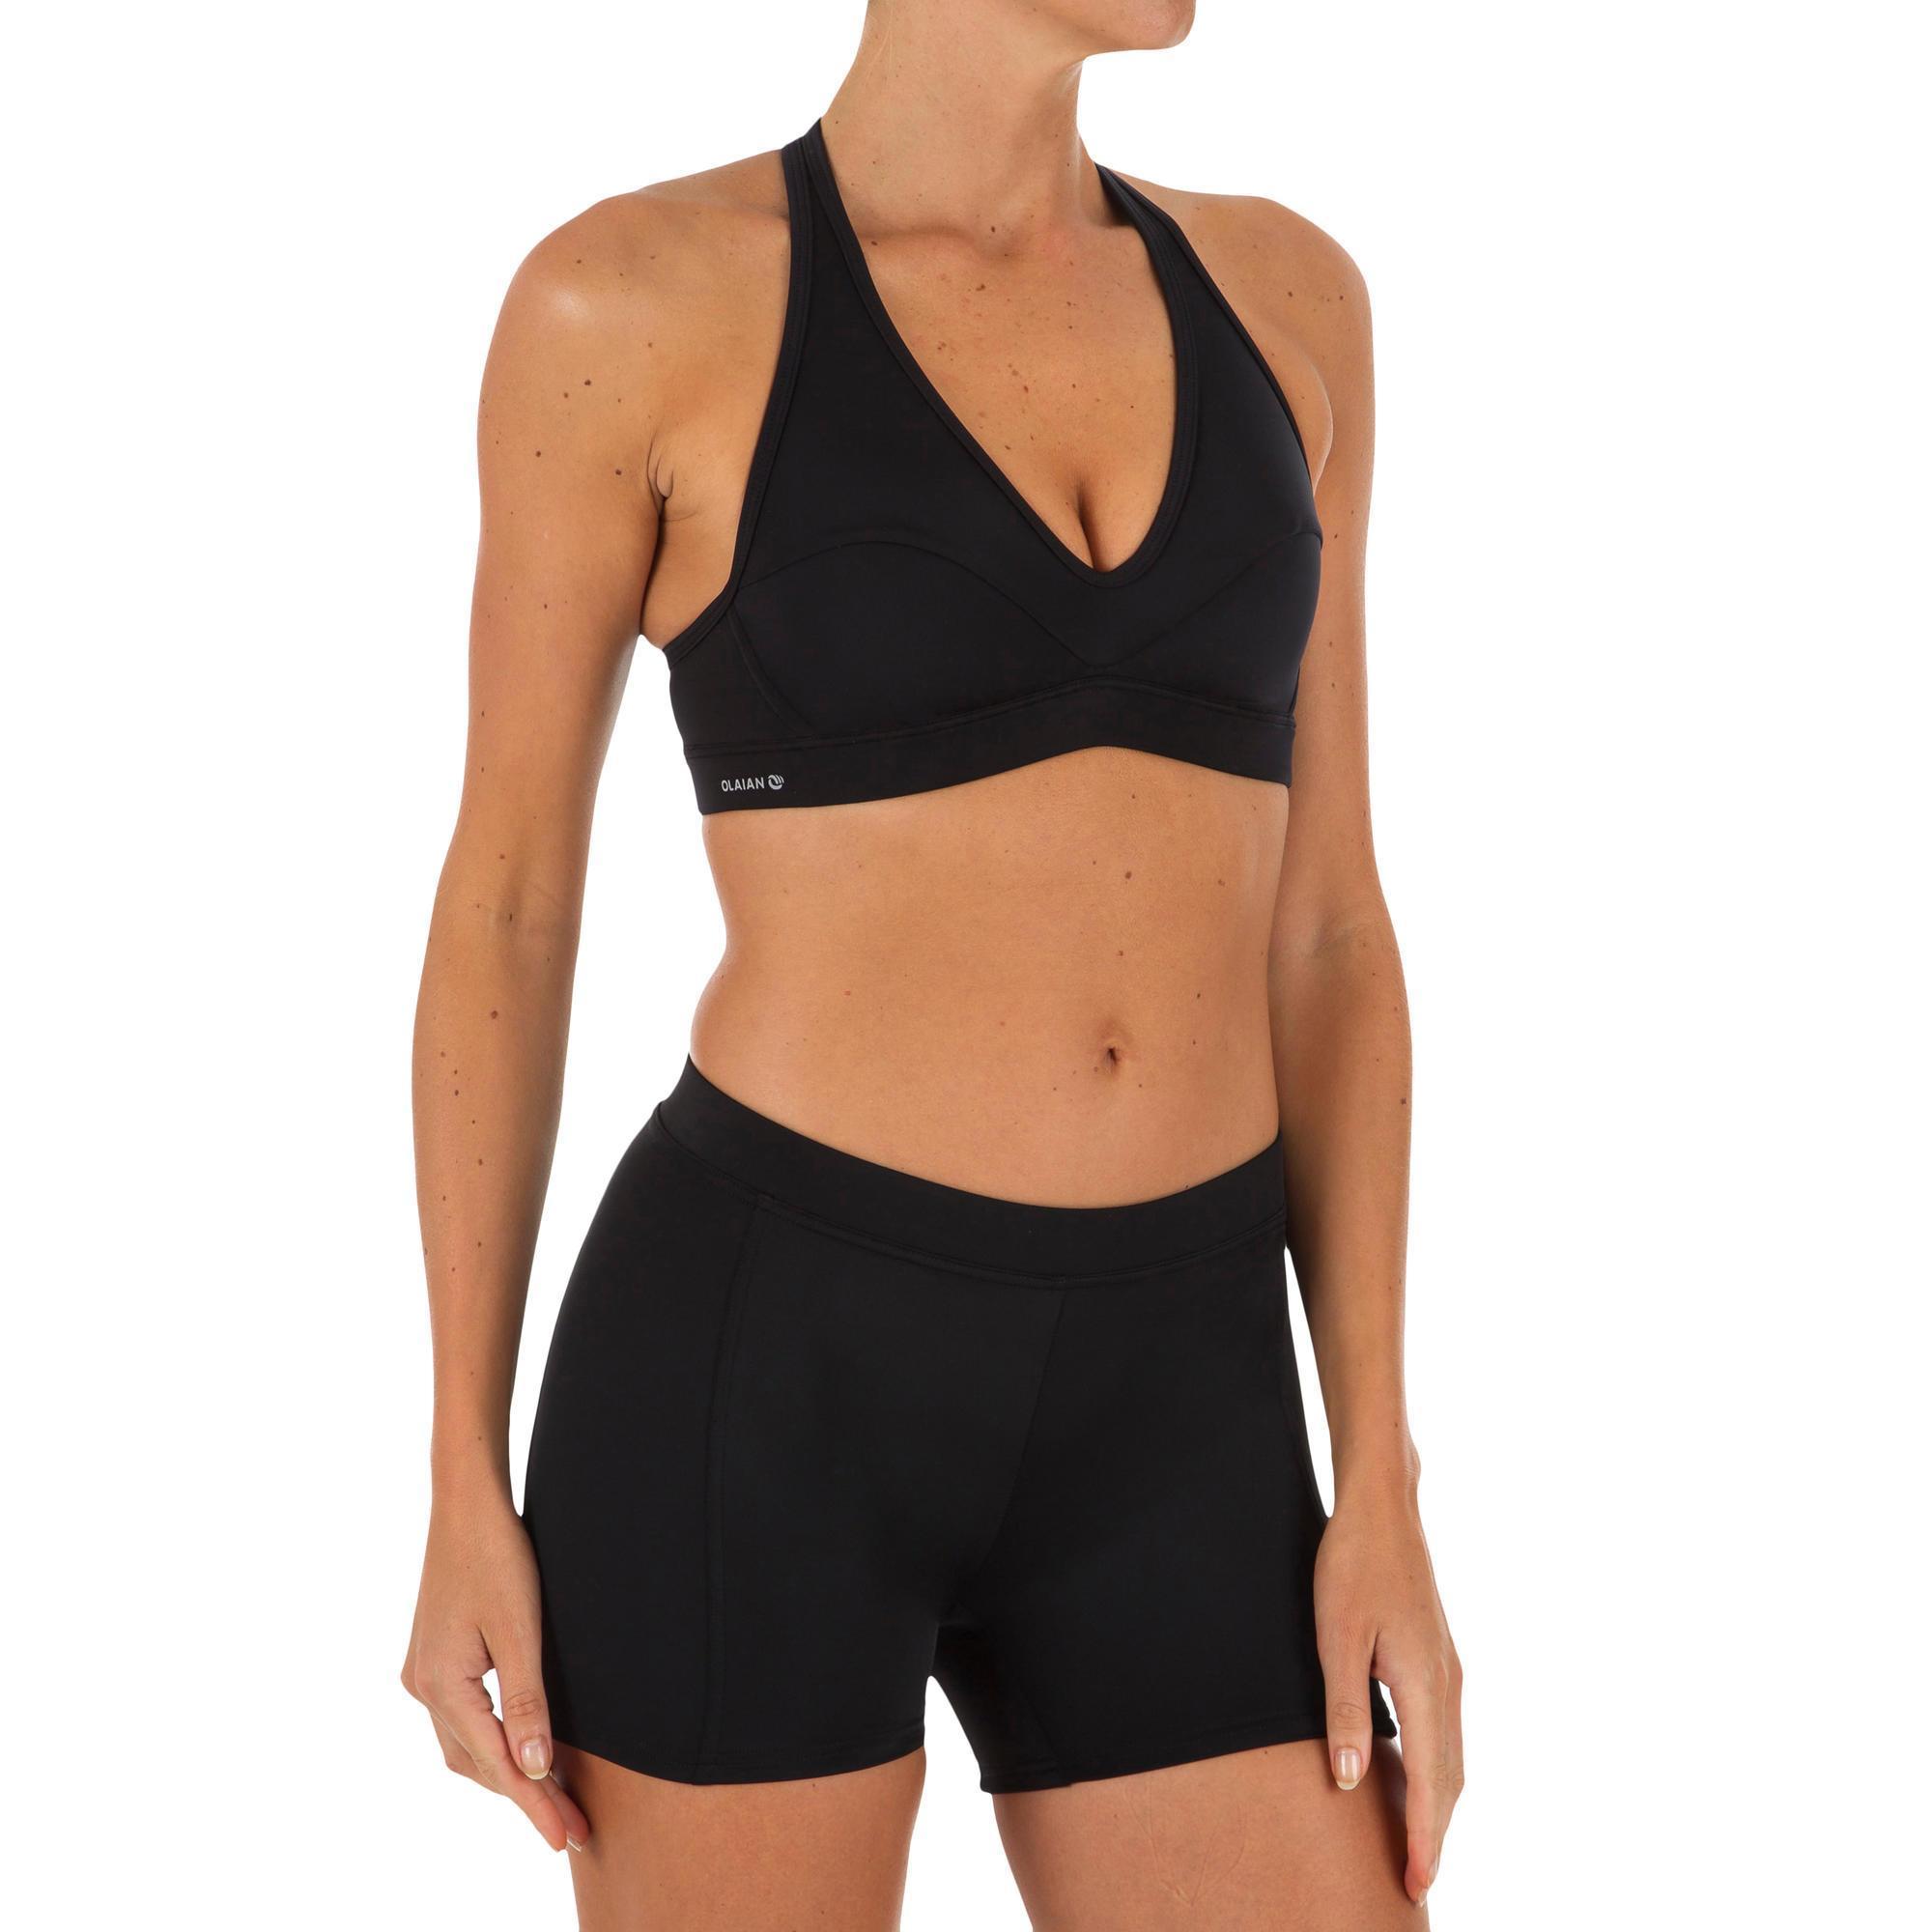 2d8f65758a46 Comprar Bikinis Surferos de Playa para Mujer Online | Decathlon